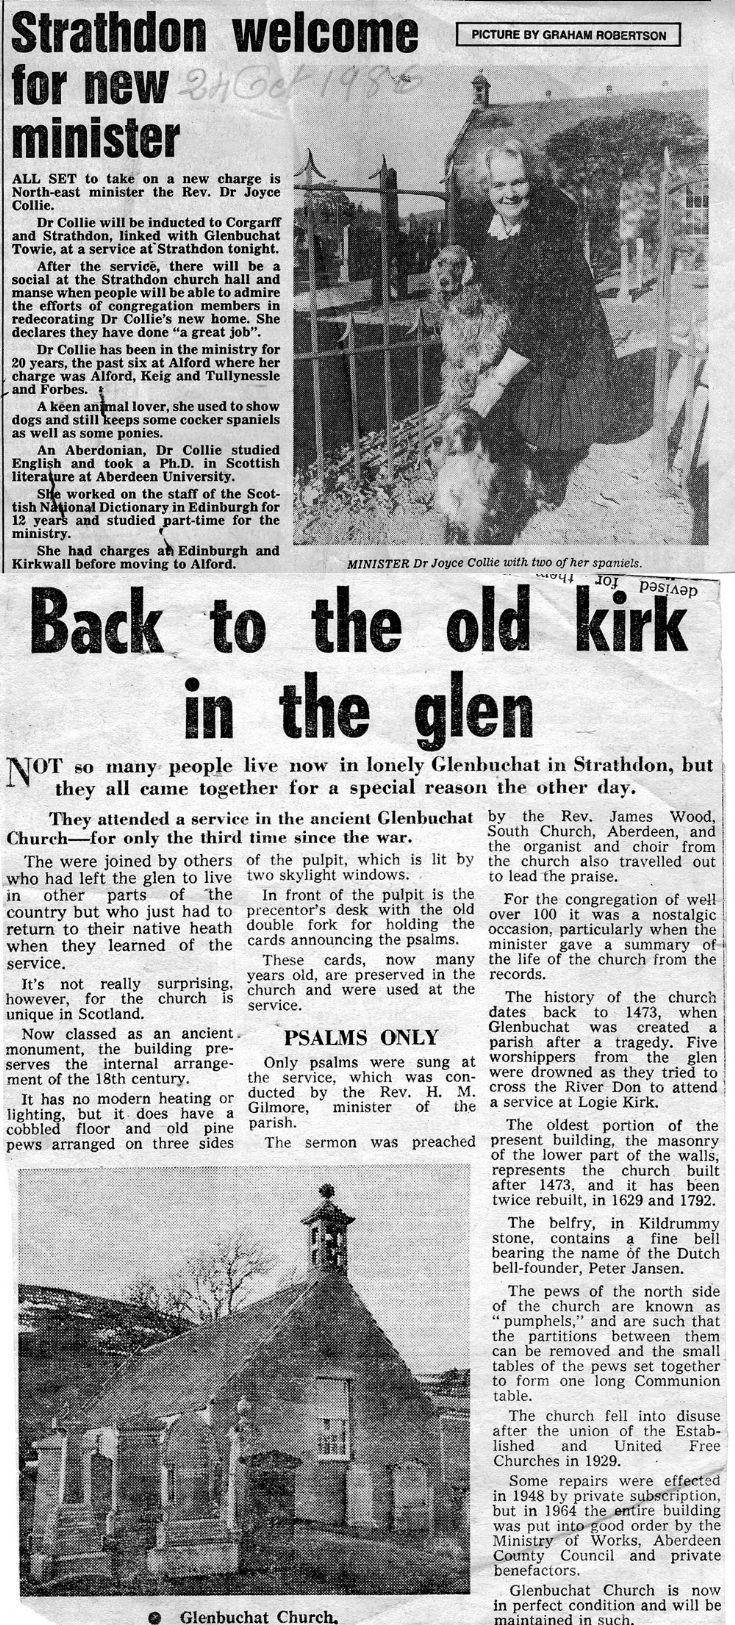 54 Glenbuchat Newspaper Cuttings